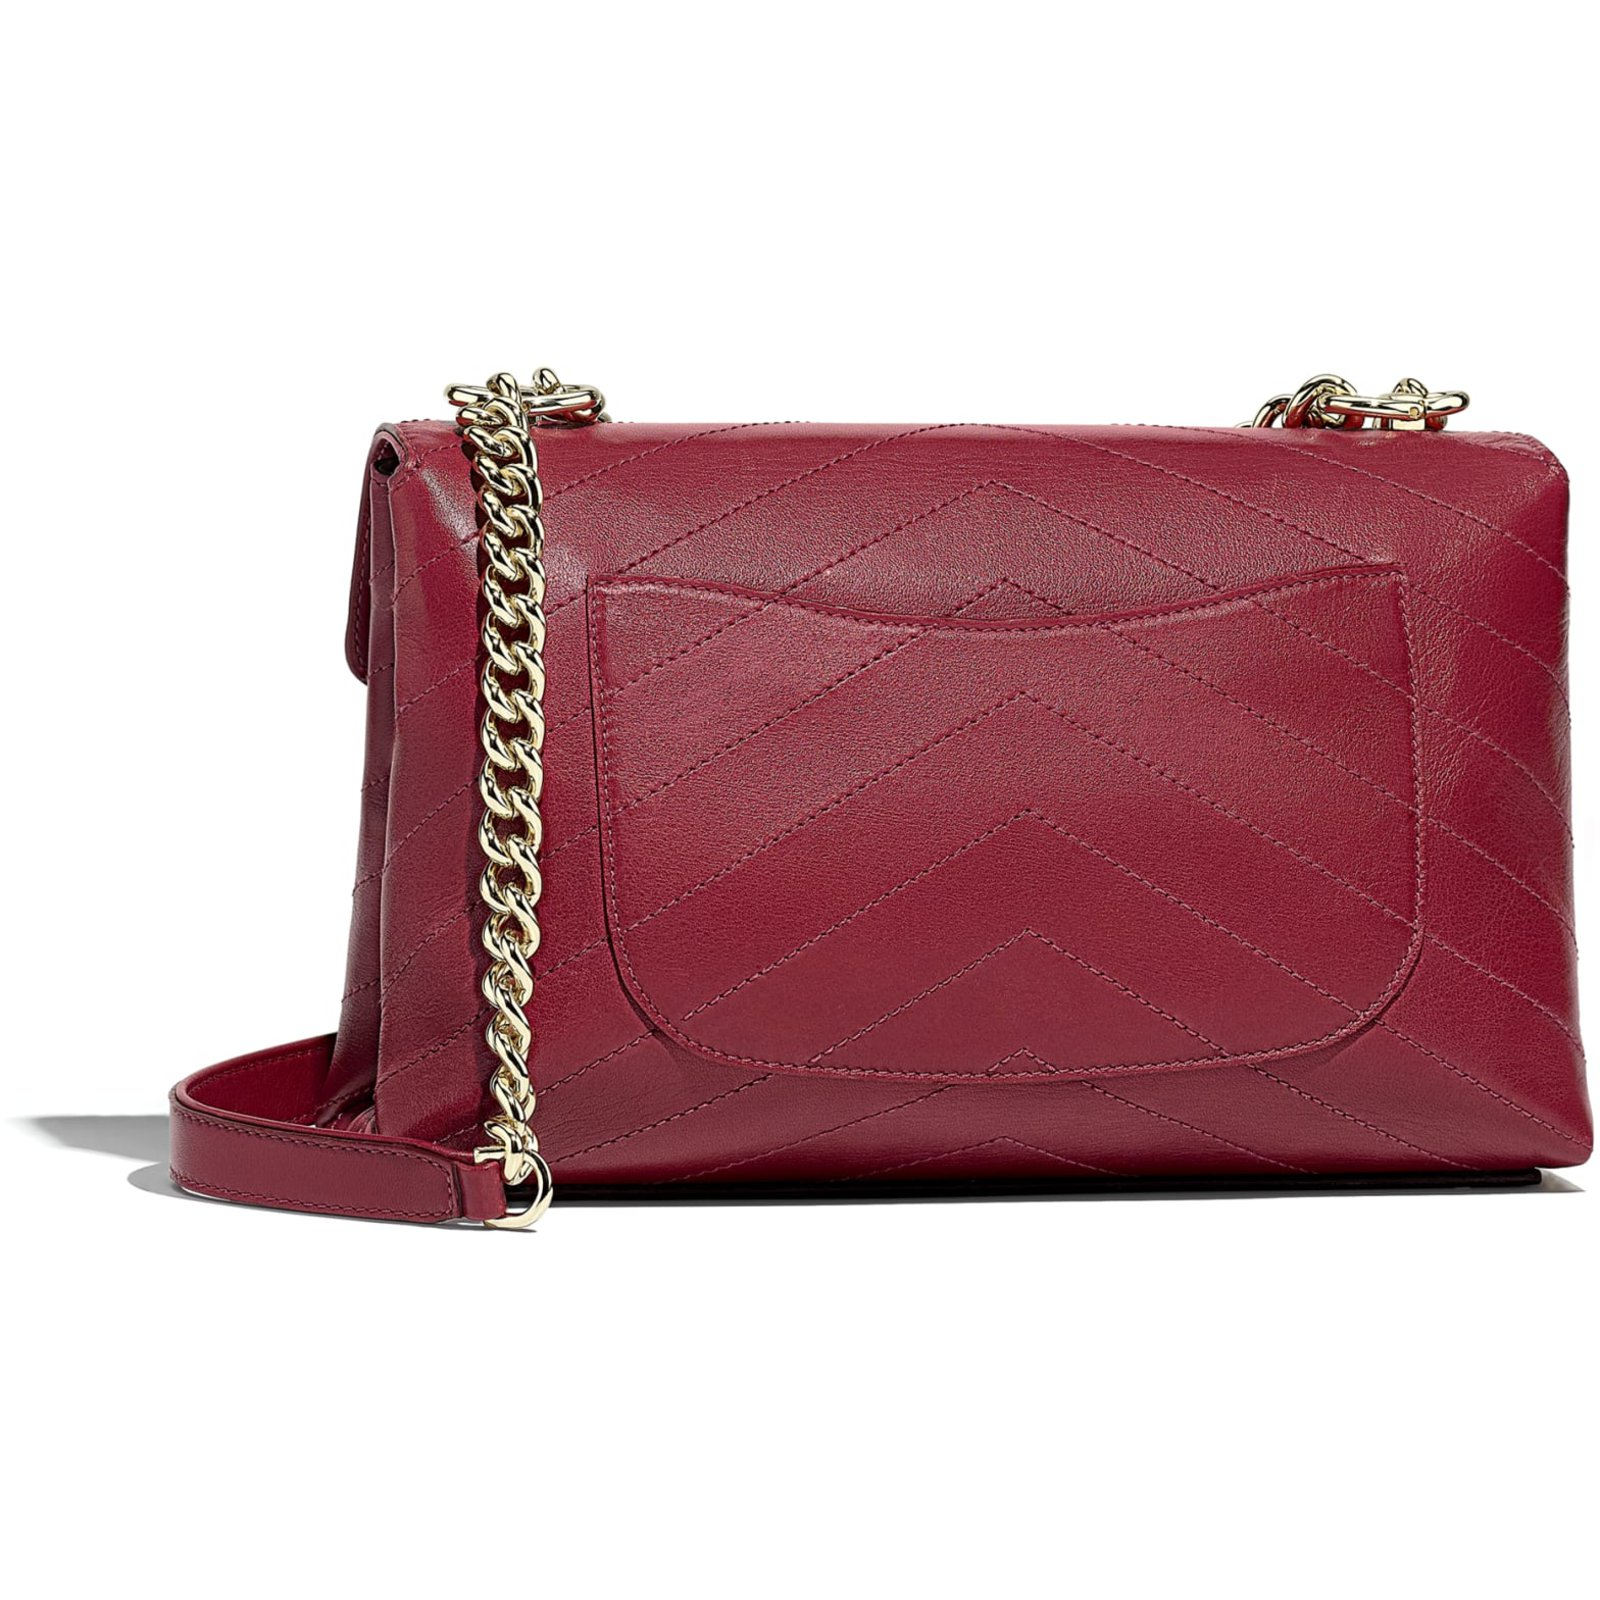 2b77dad03e2011 Chanel New gold chanel hardware pink bag Handbags Leather Pink ref.99178 -  Joli Closet